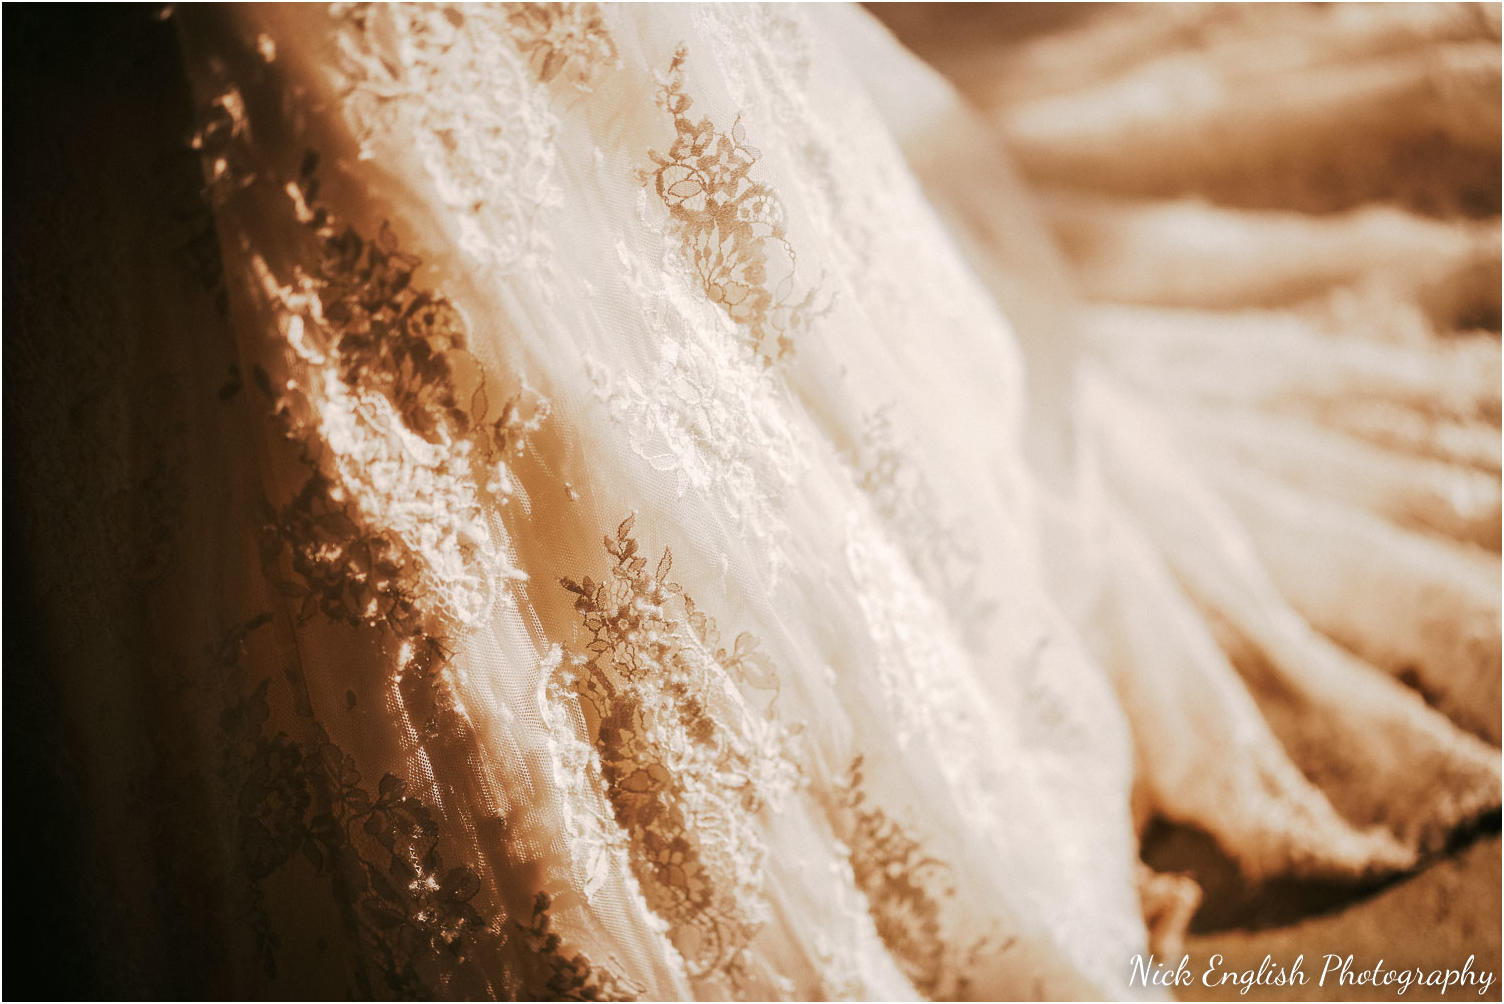 Destination_Wedding_Photographer_Slovenia_Nick_English_Photography-70-19.jpg